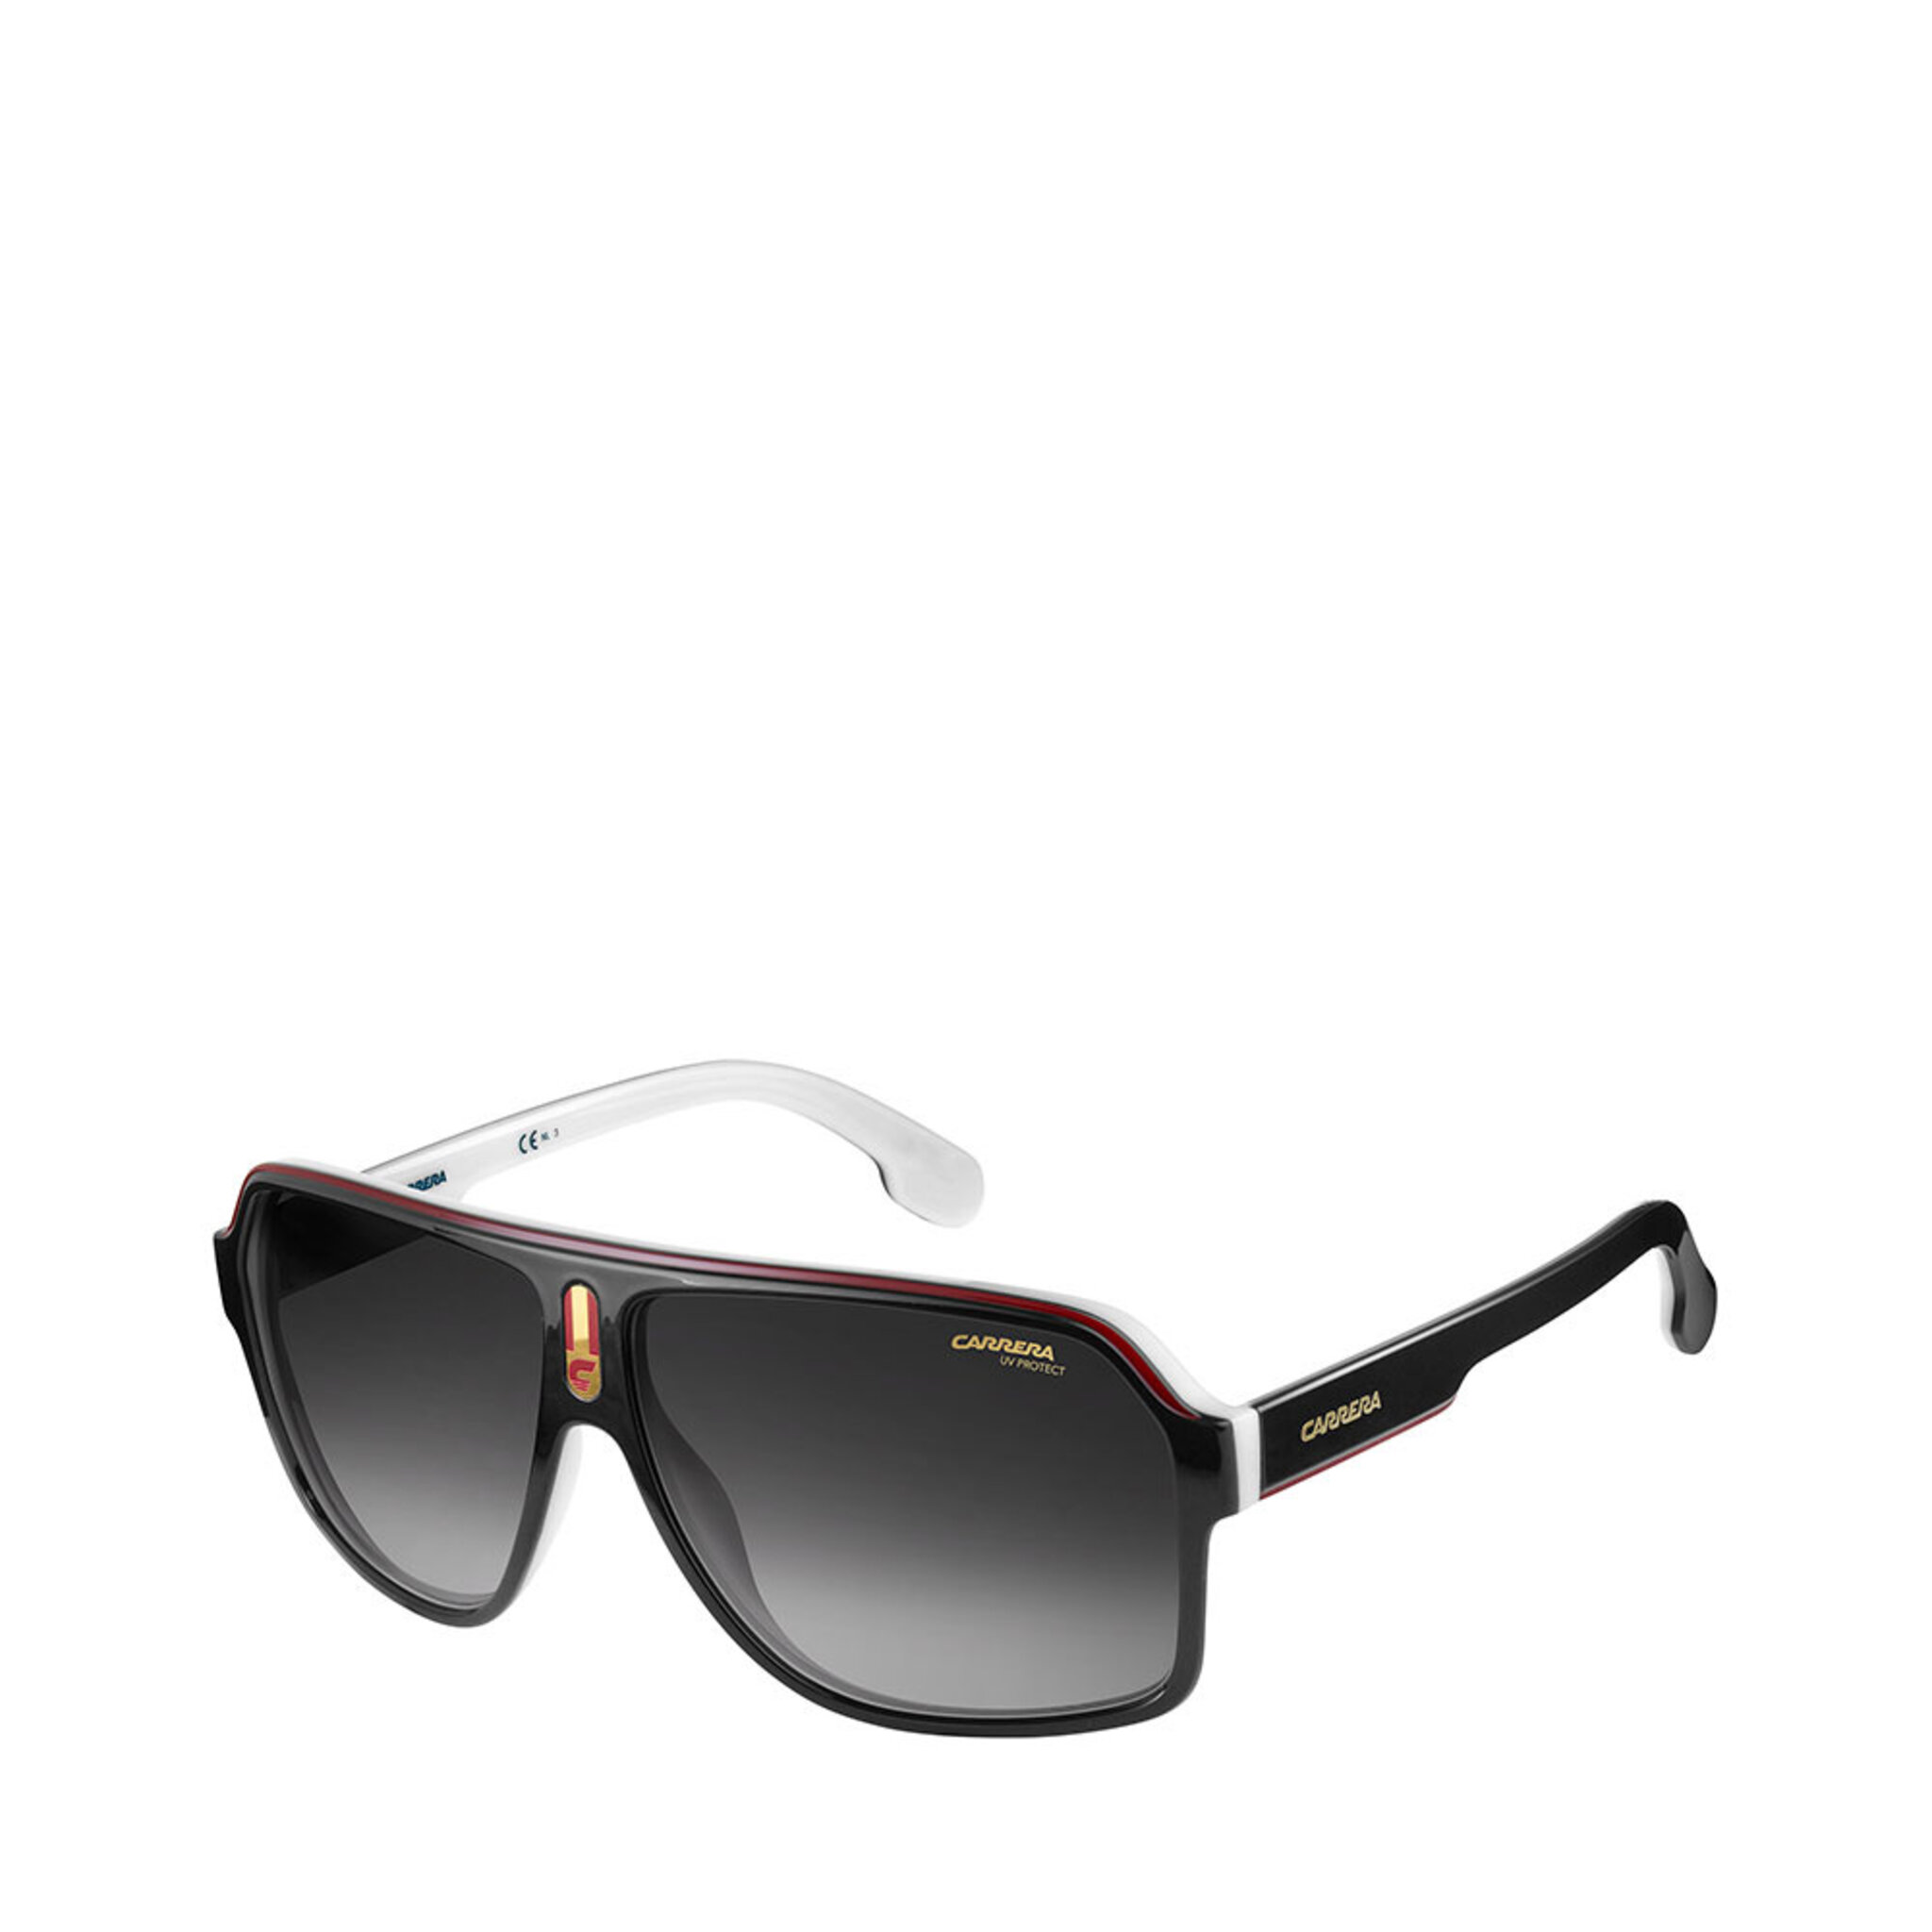 Sunglasses 1001/S